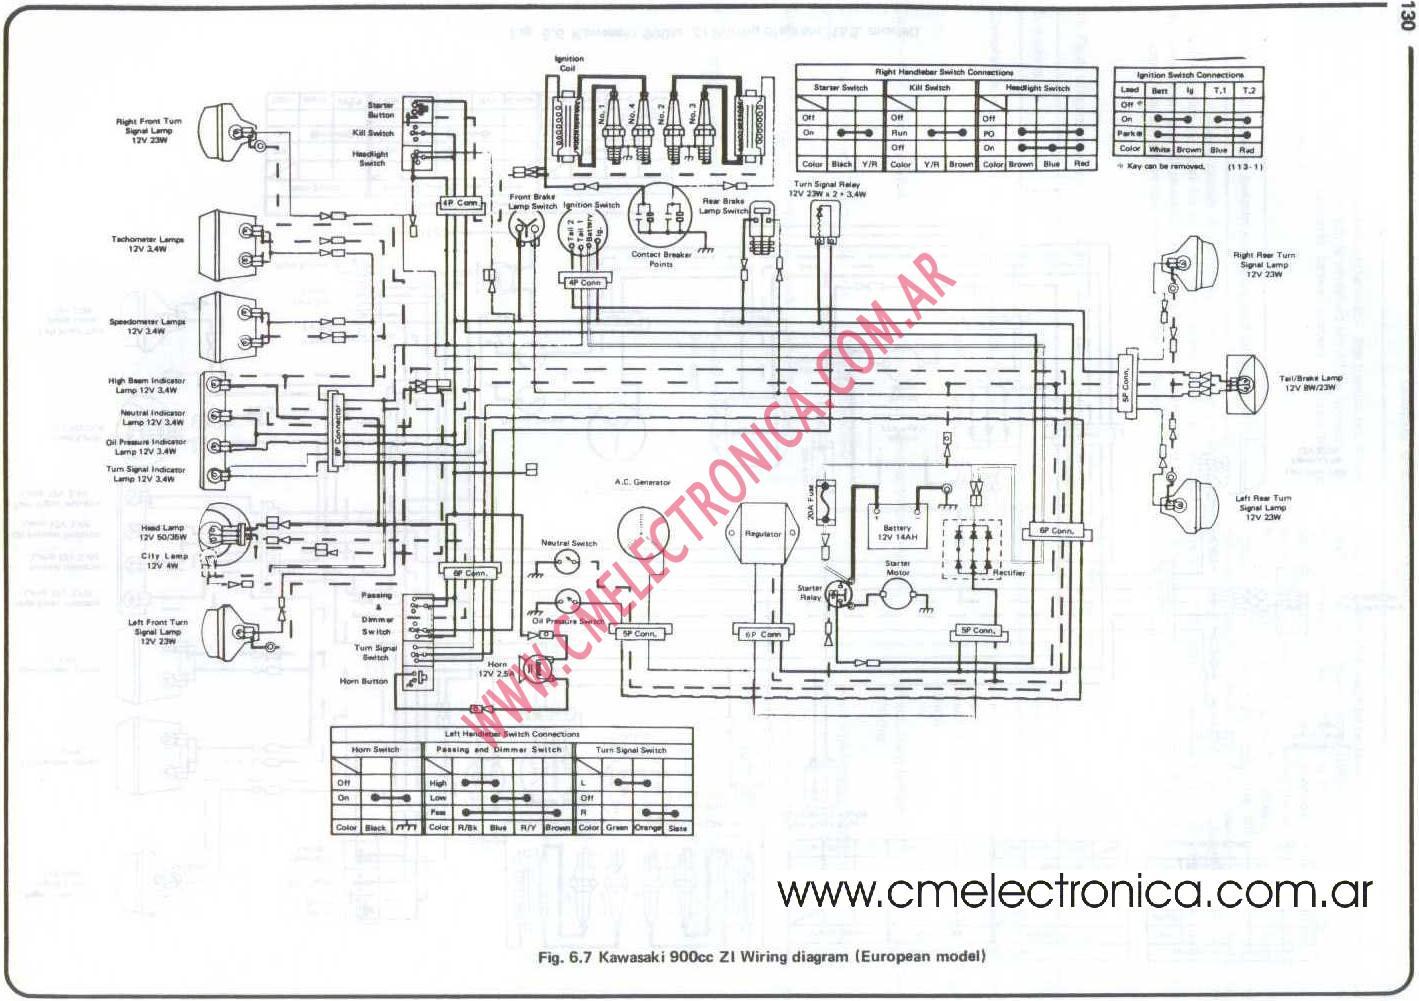 660 Raptor Cdi Wiring Diagram - Four.ineedmorespace.co • on yfm350 wiring diagram, raptor 700r wiring diagram, raptor 660 exploded view, stratoliner wiring diagram, raptor 660 wire harness, raptor 660 thermostat, raptor 660 engine, crf250r wiring diagram, raptor 660 manual, raptor 660 solenoid, trx250r wiring diagram, predator 500 wiring diagram, yfz450r wiring diagram, outlaw 500 wiring diagram, raptor 660 water pump, 250x wiring diagram, kodiak wiring diagram, renegade wiring diagram, quad wiring diagram, yz 80 wiring diagram,